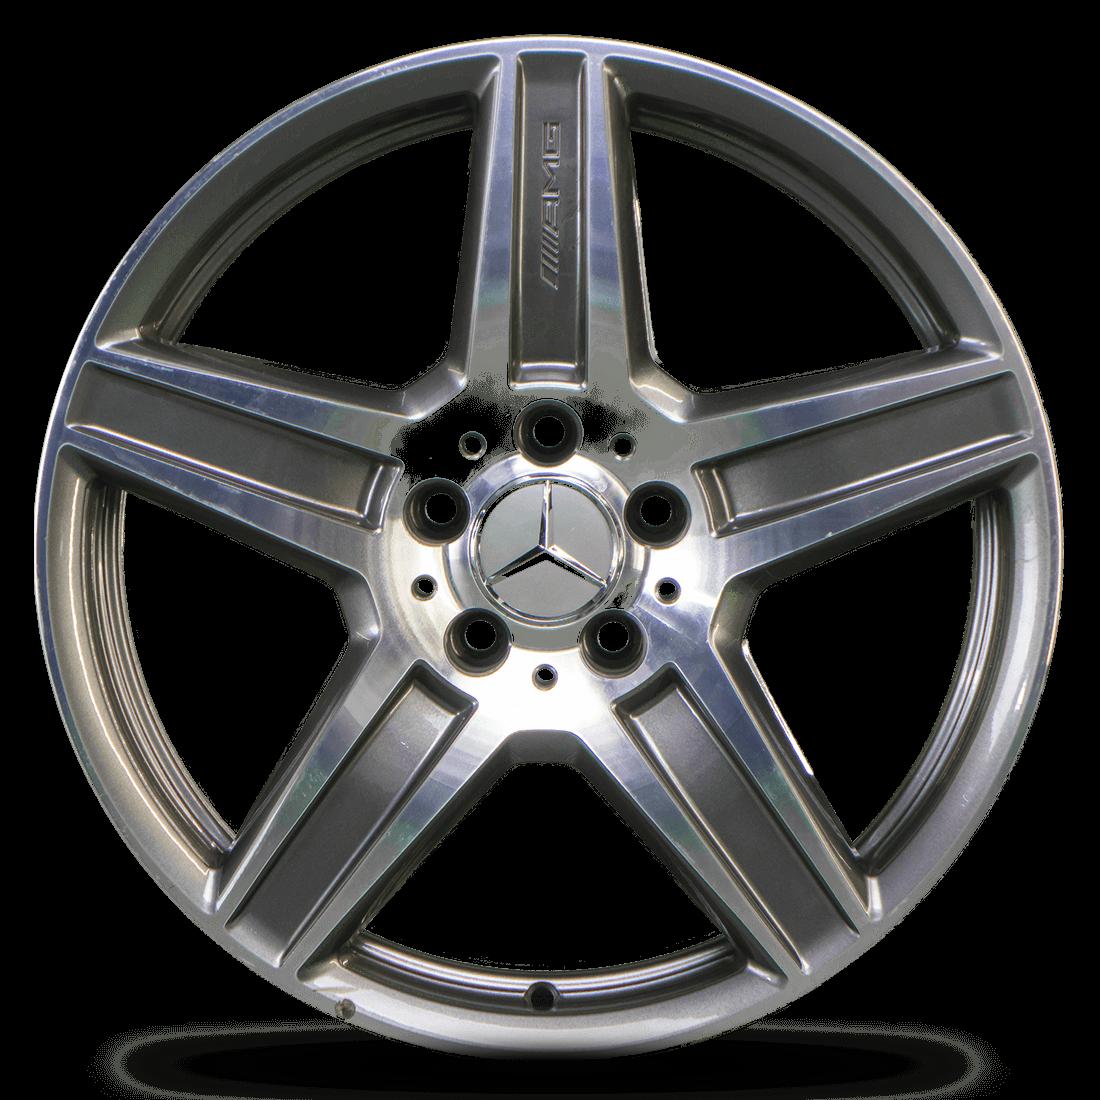 Mercedes Benz Rims >> 1x 18 Inch Amg Rim Mercedes Benz E Class W212 S212 Aluminum Rim A2124012502